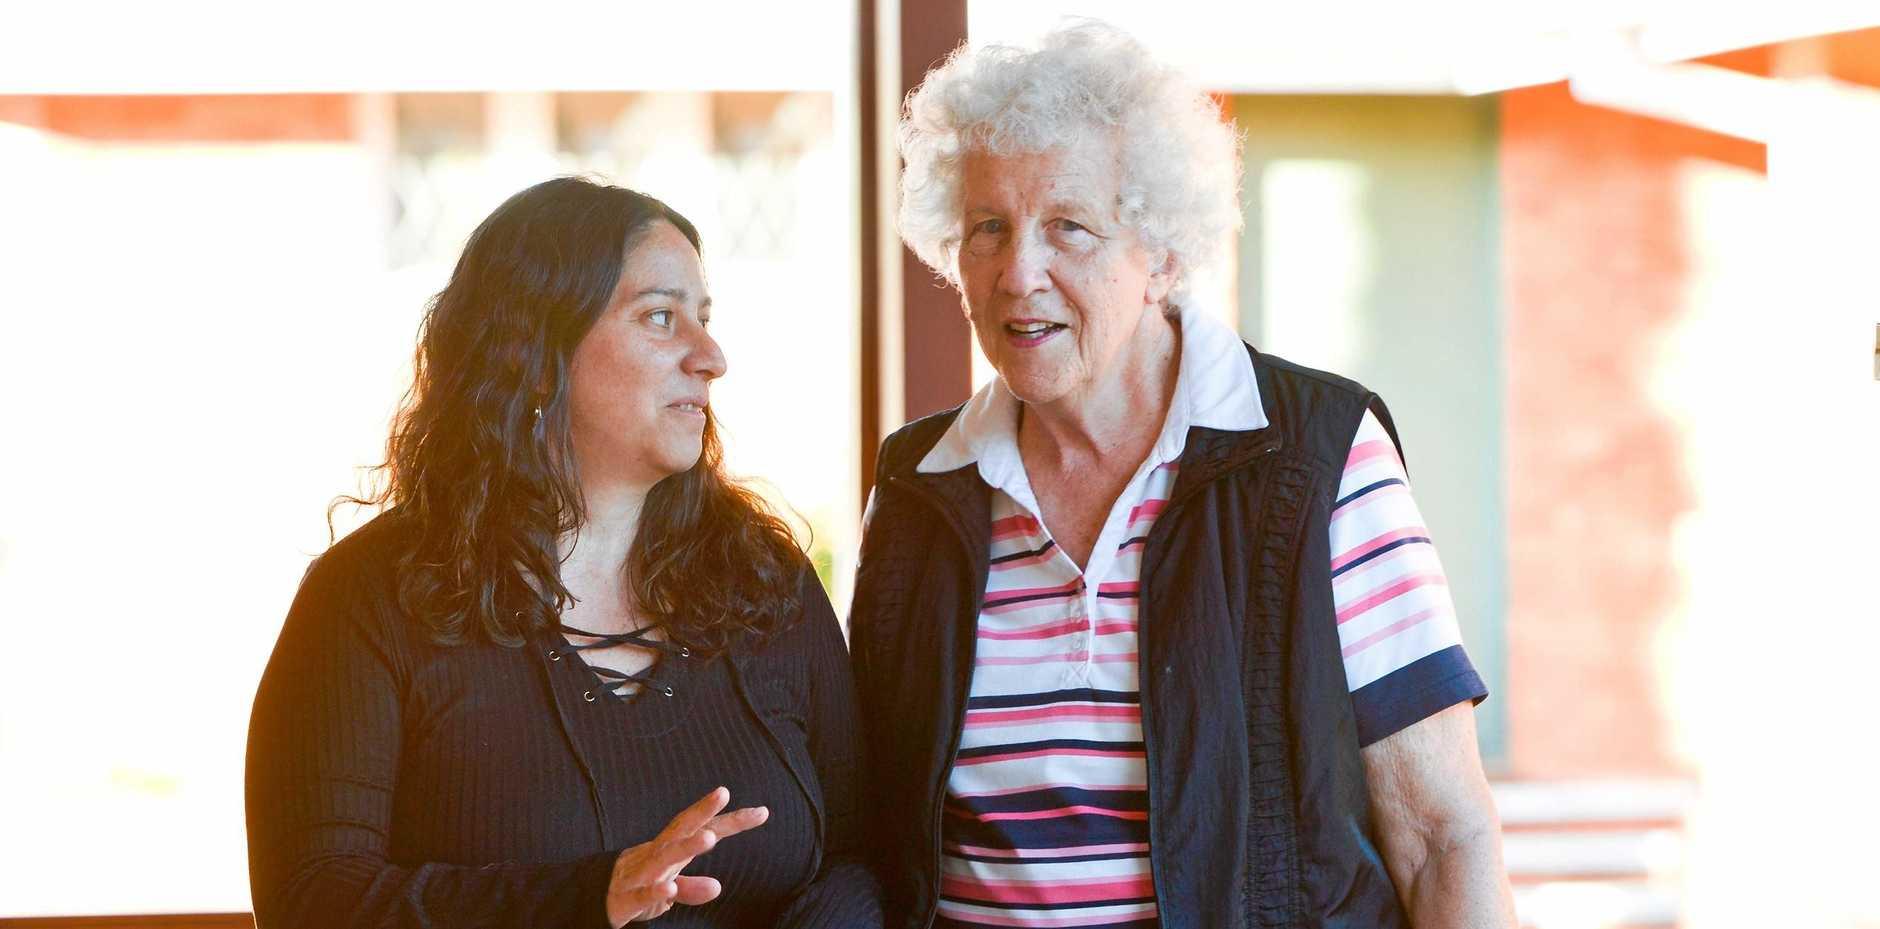 OPEN ARMS: Welcoming Intercultural Neighbours director Natalia Muszkat (left) with St Saviour's Anglican Church volunteer Carmelita Van Deventer.